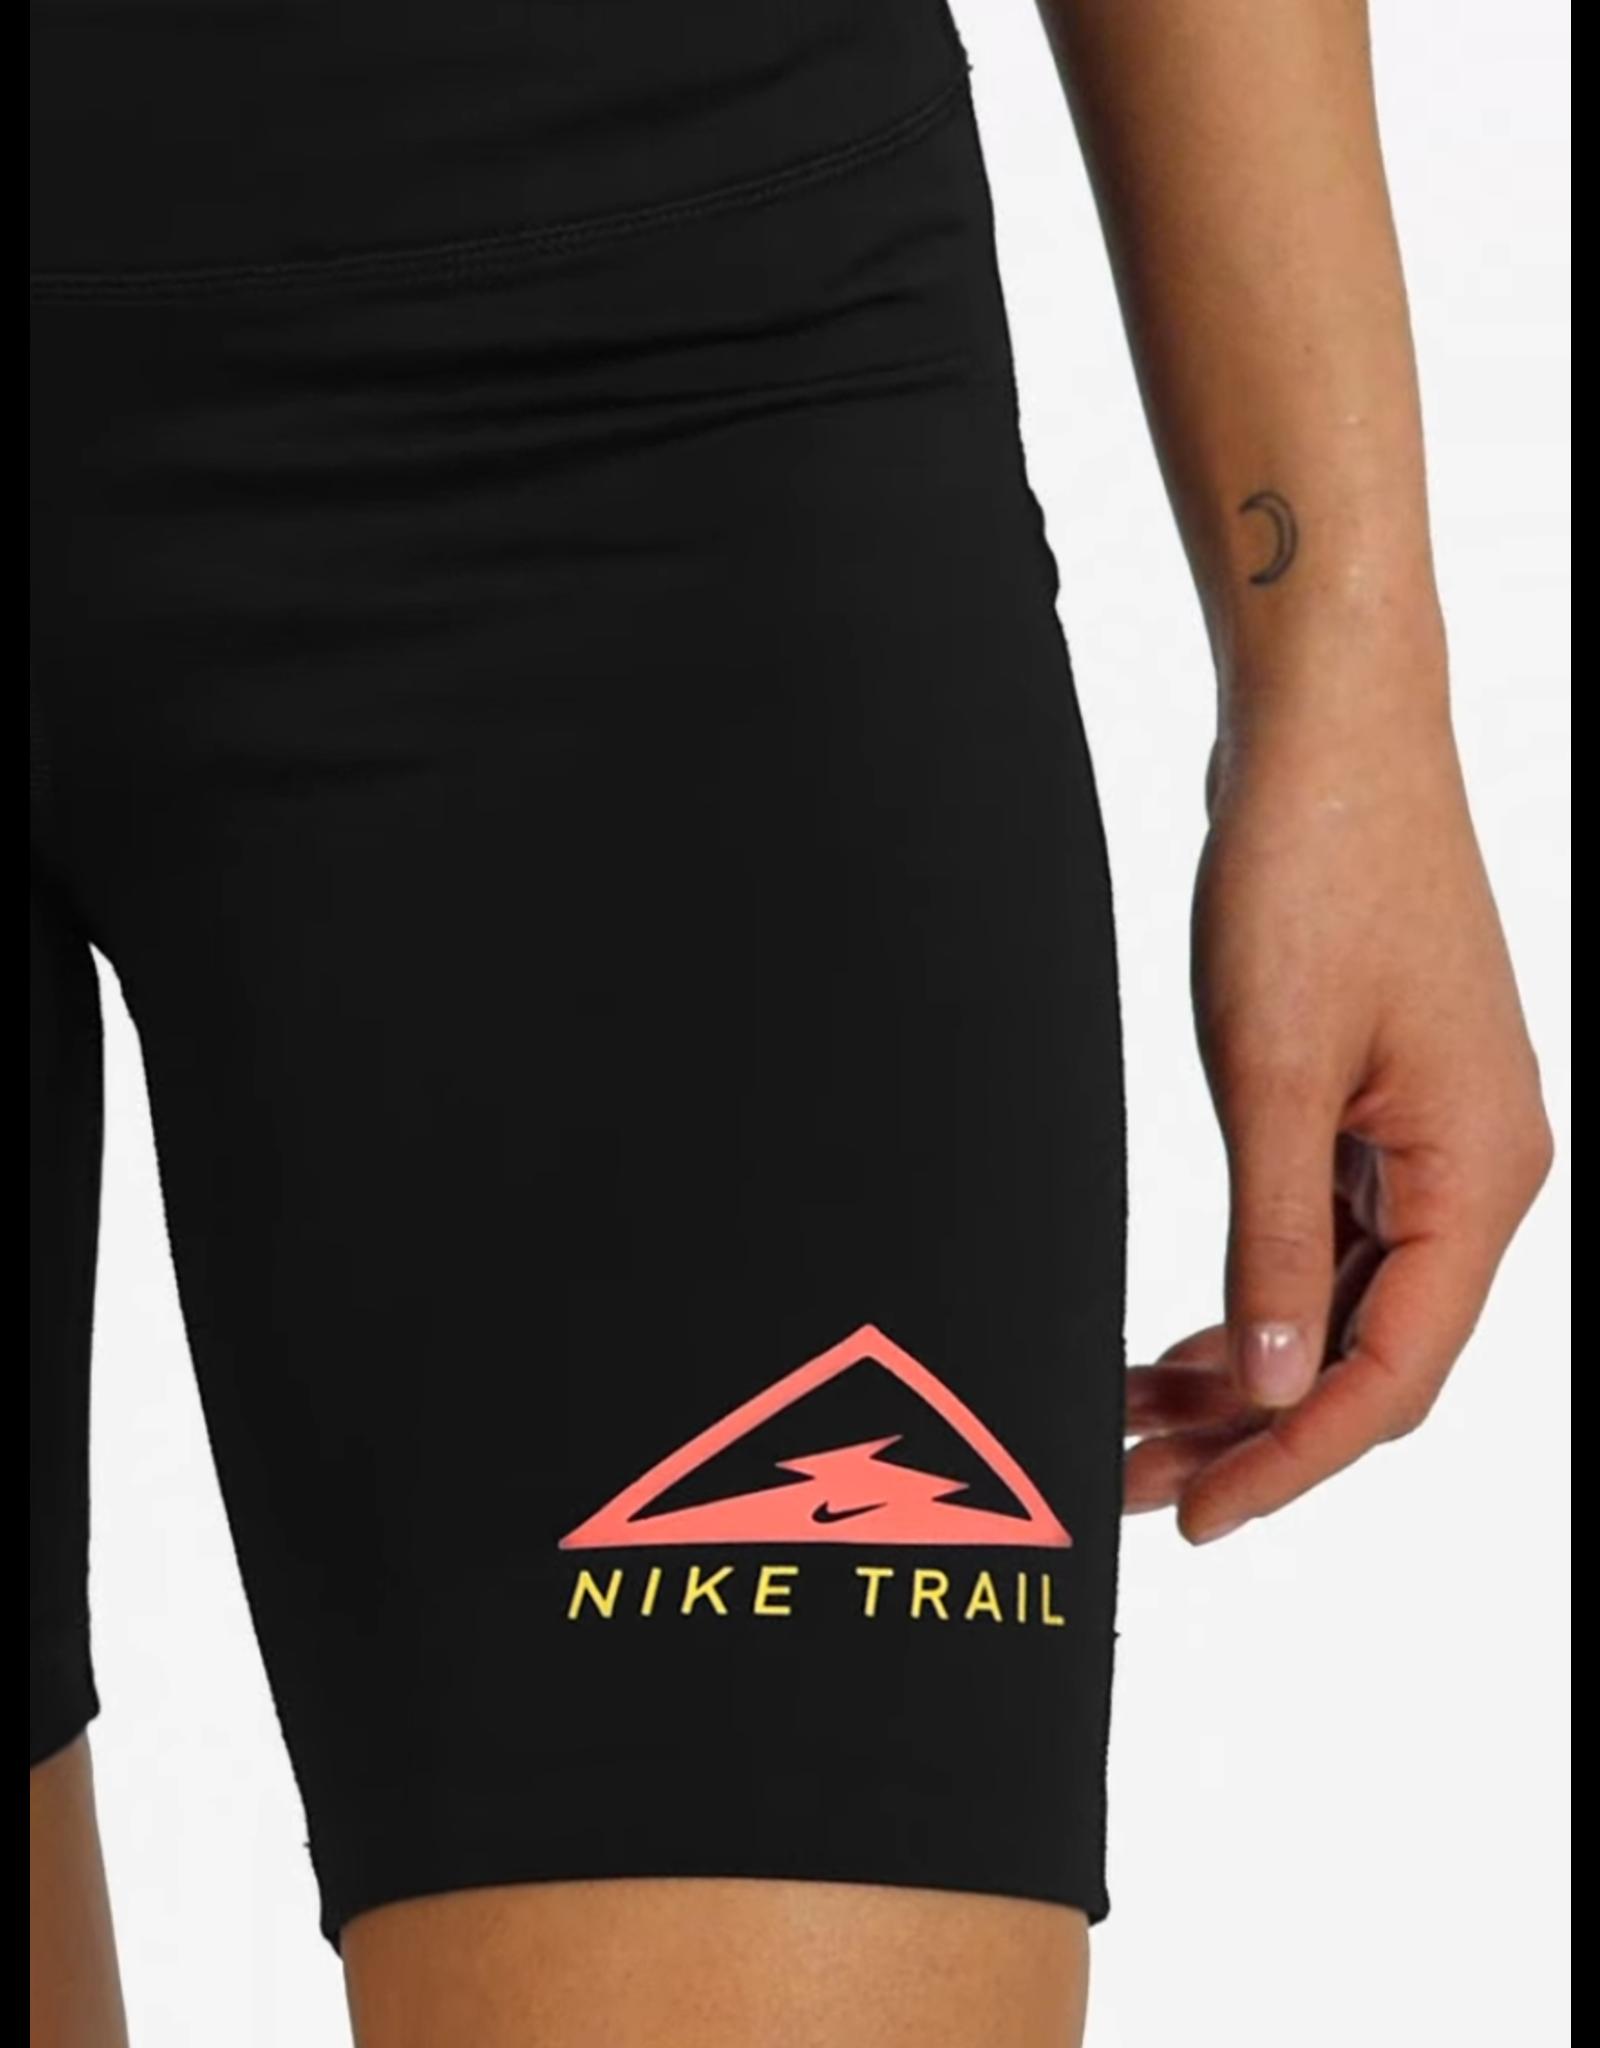 Nike Womens Nike Fast Short Trail